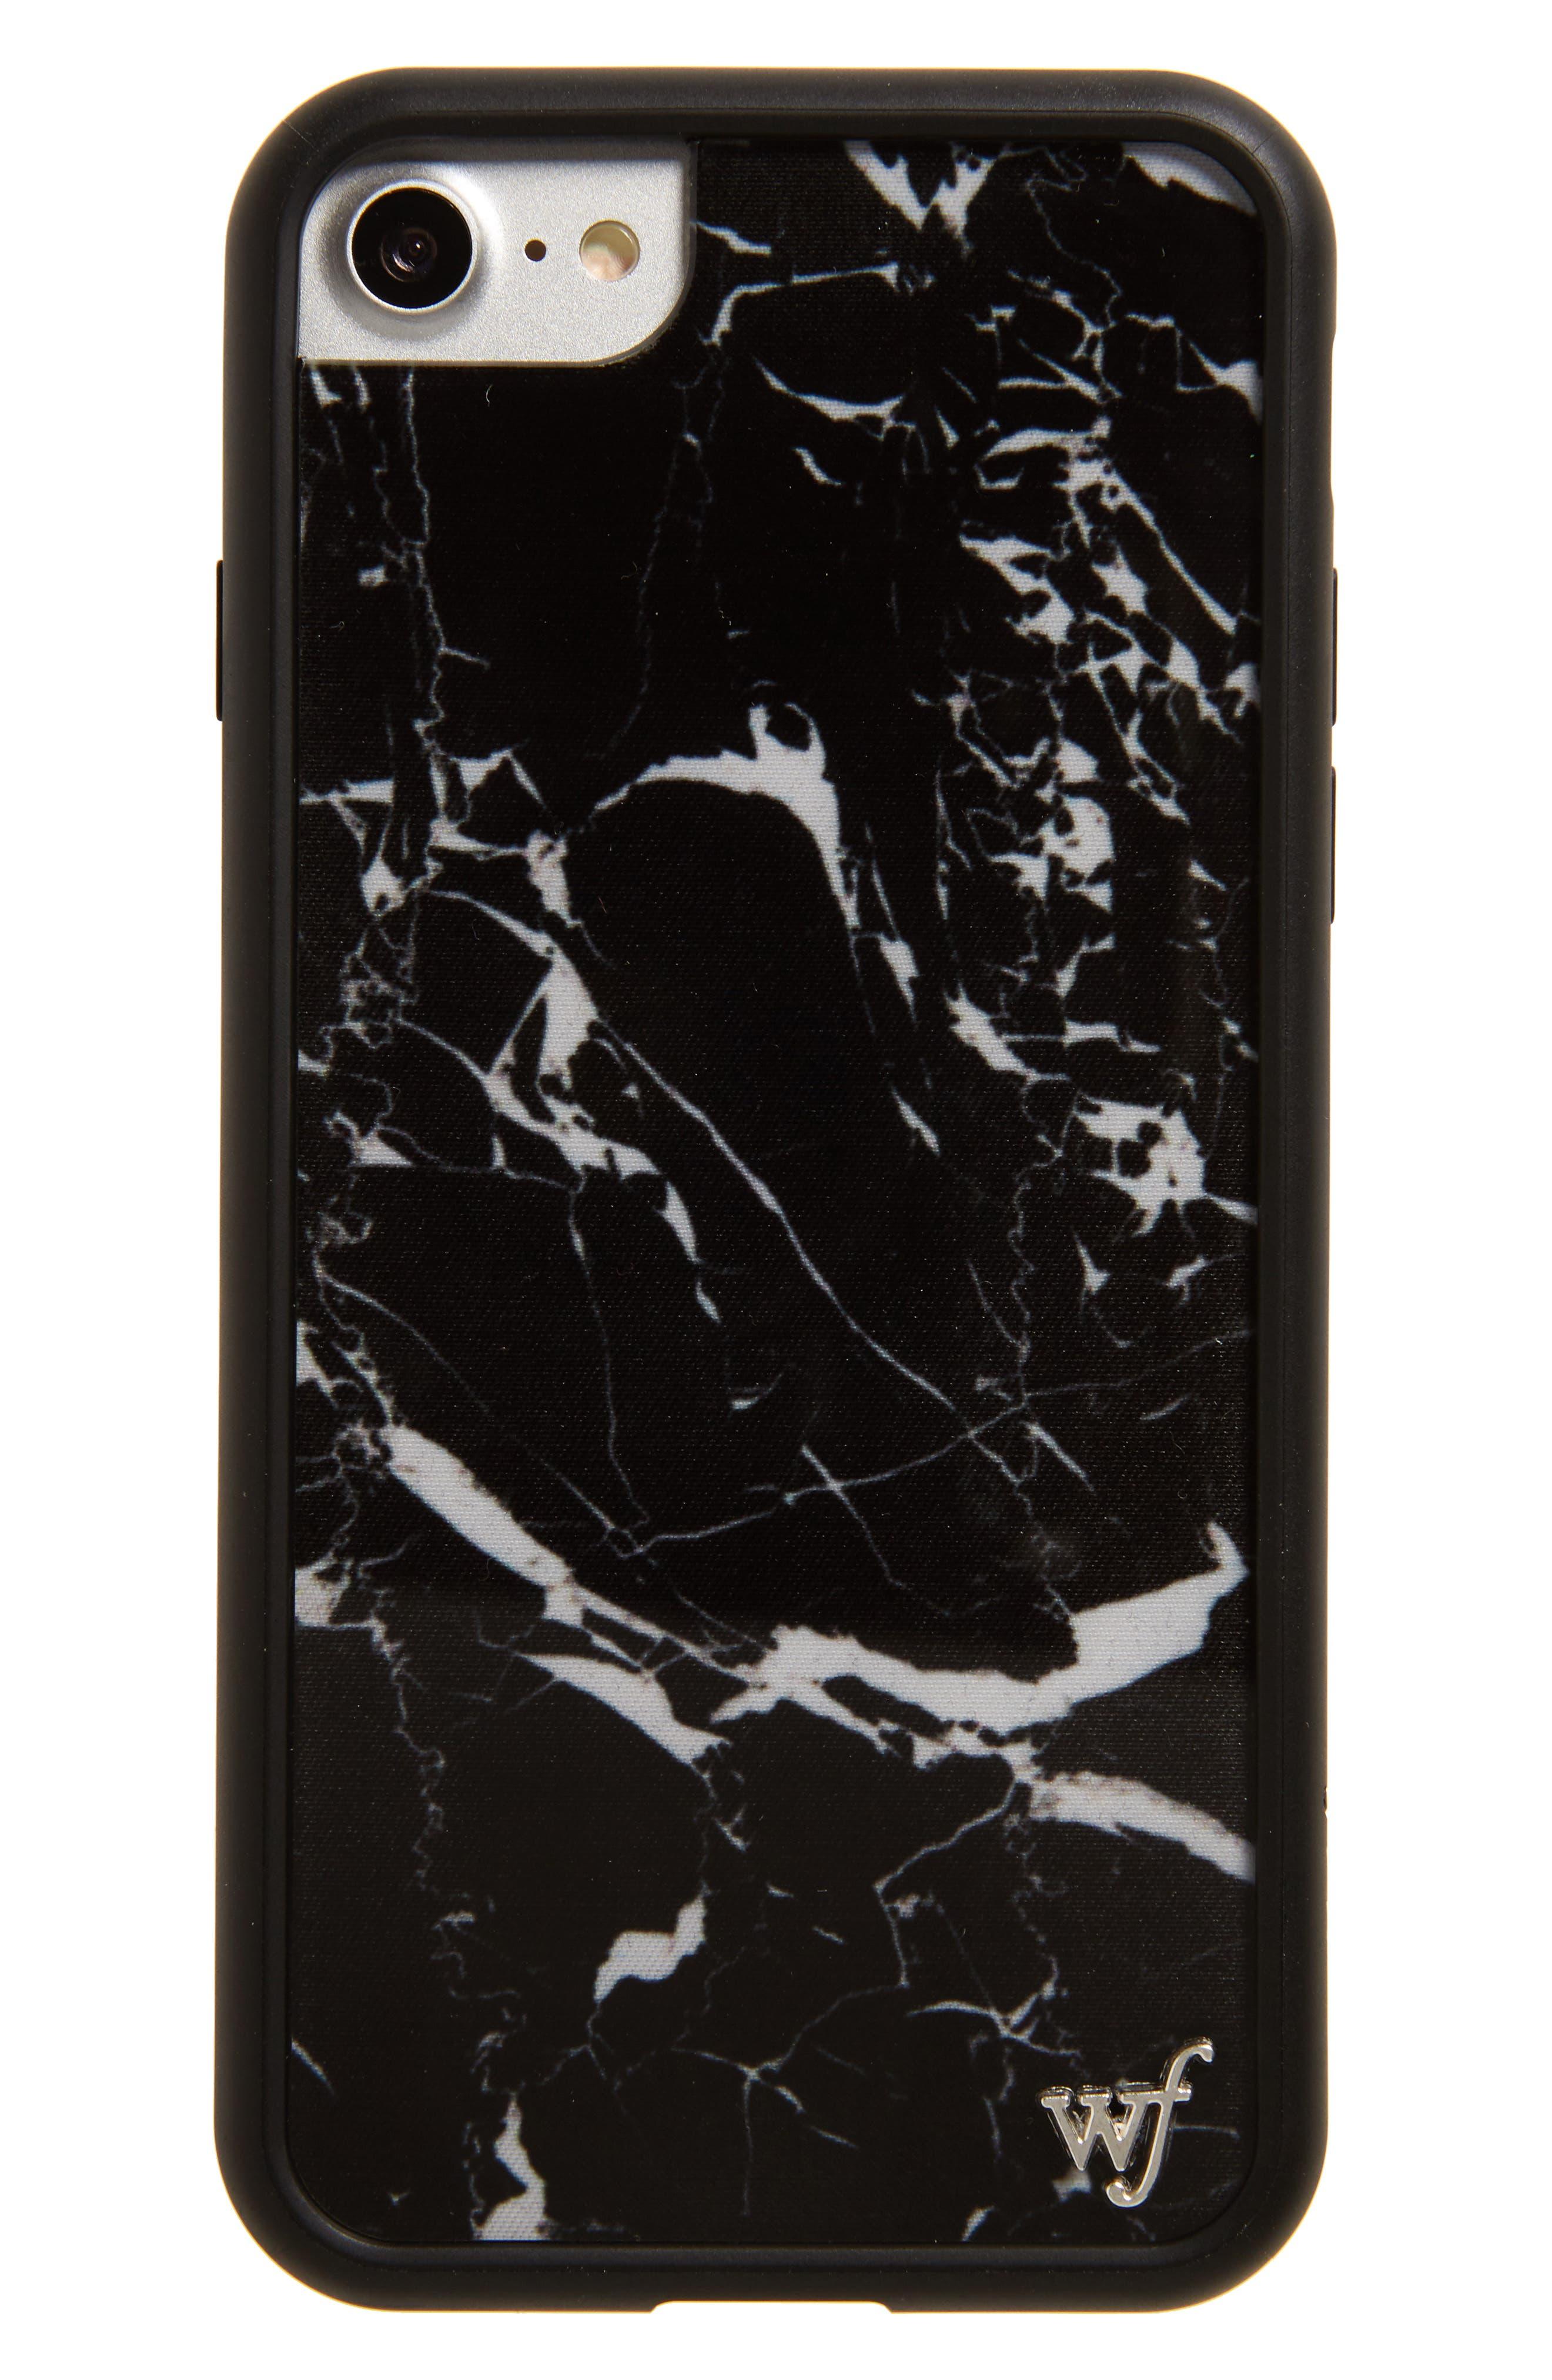 Wildflower Marble iPhone 7 Case